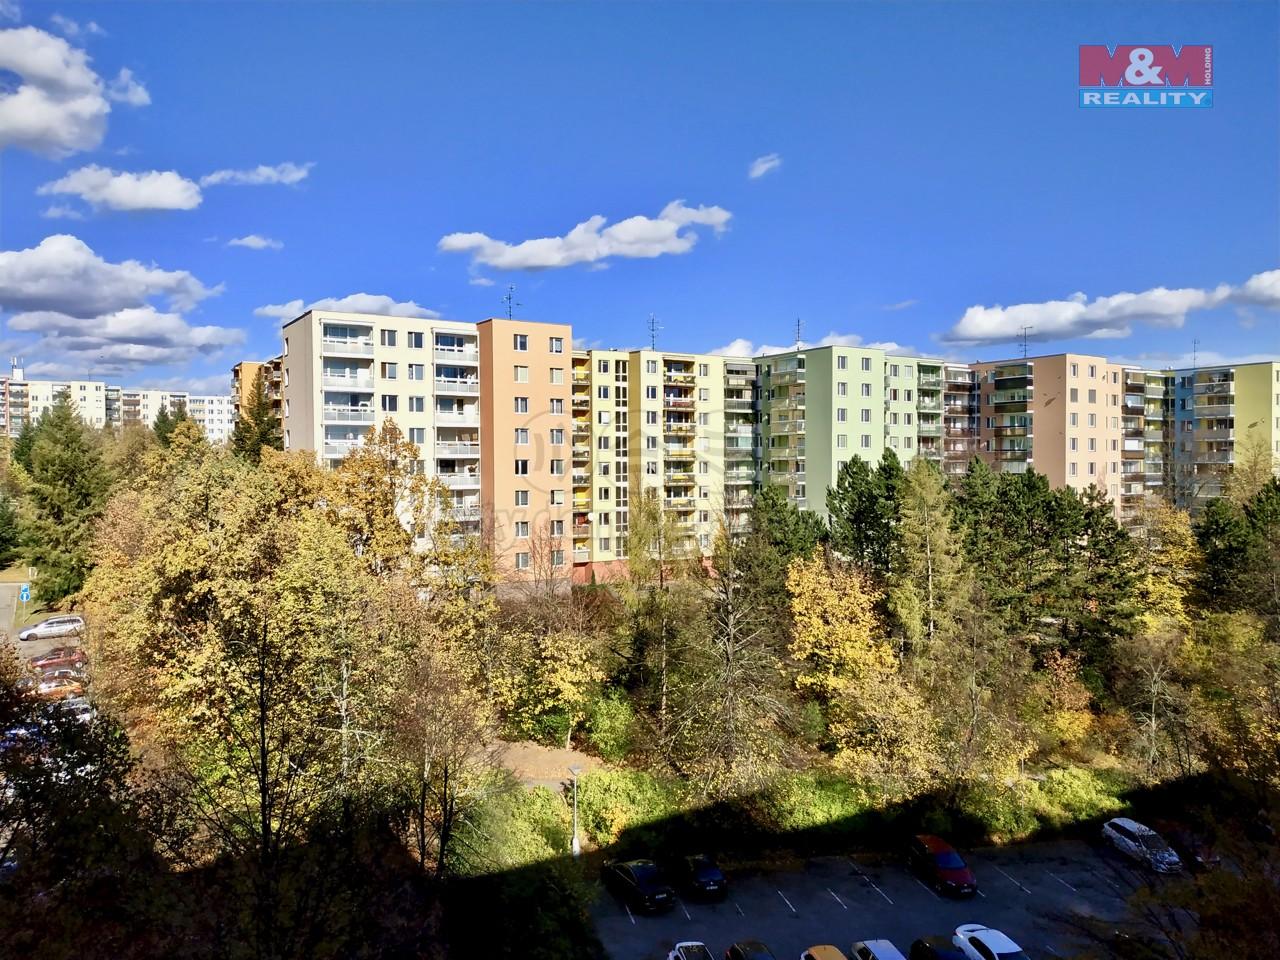 Prodej, byt 3+1, Brno - Bohunice, ul. Armenská